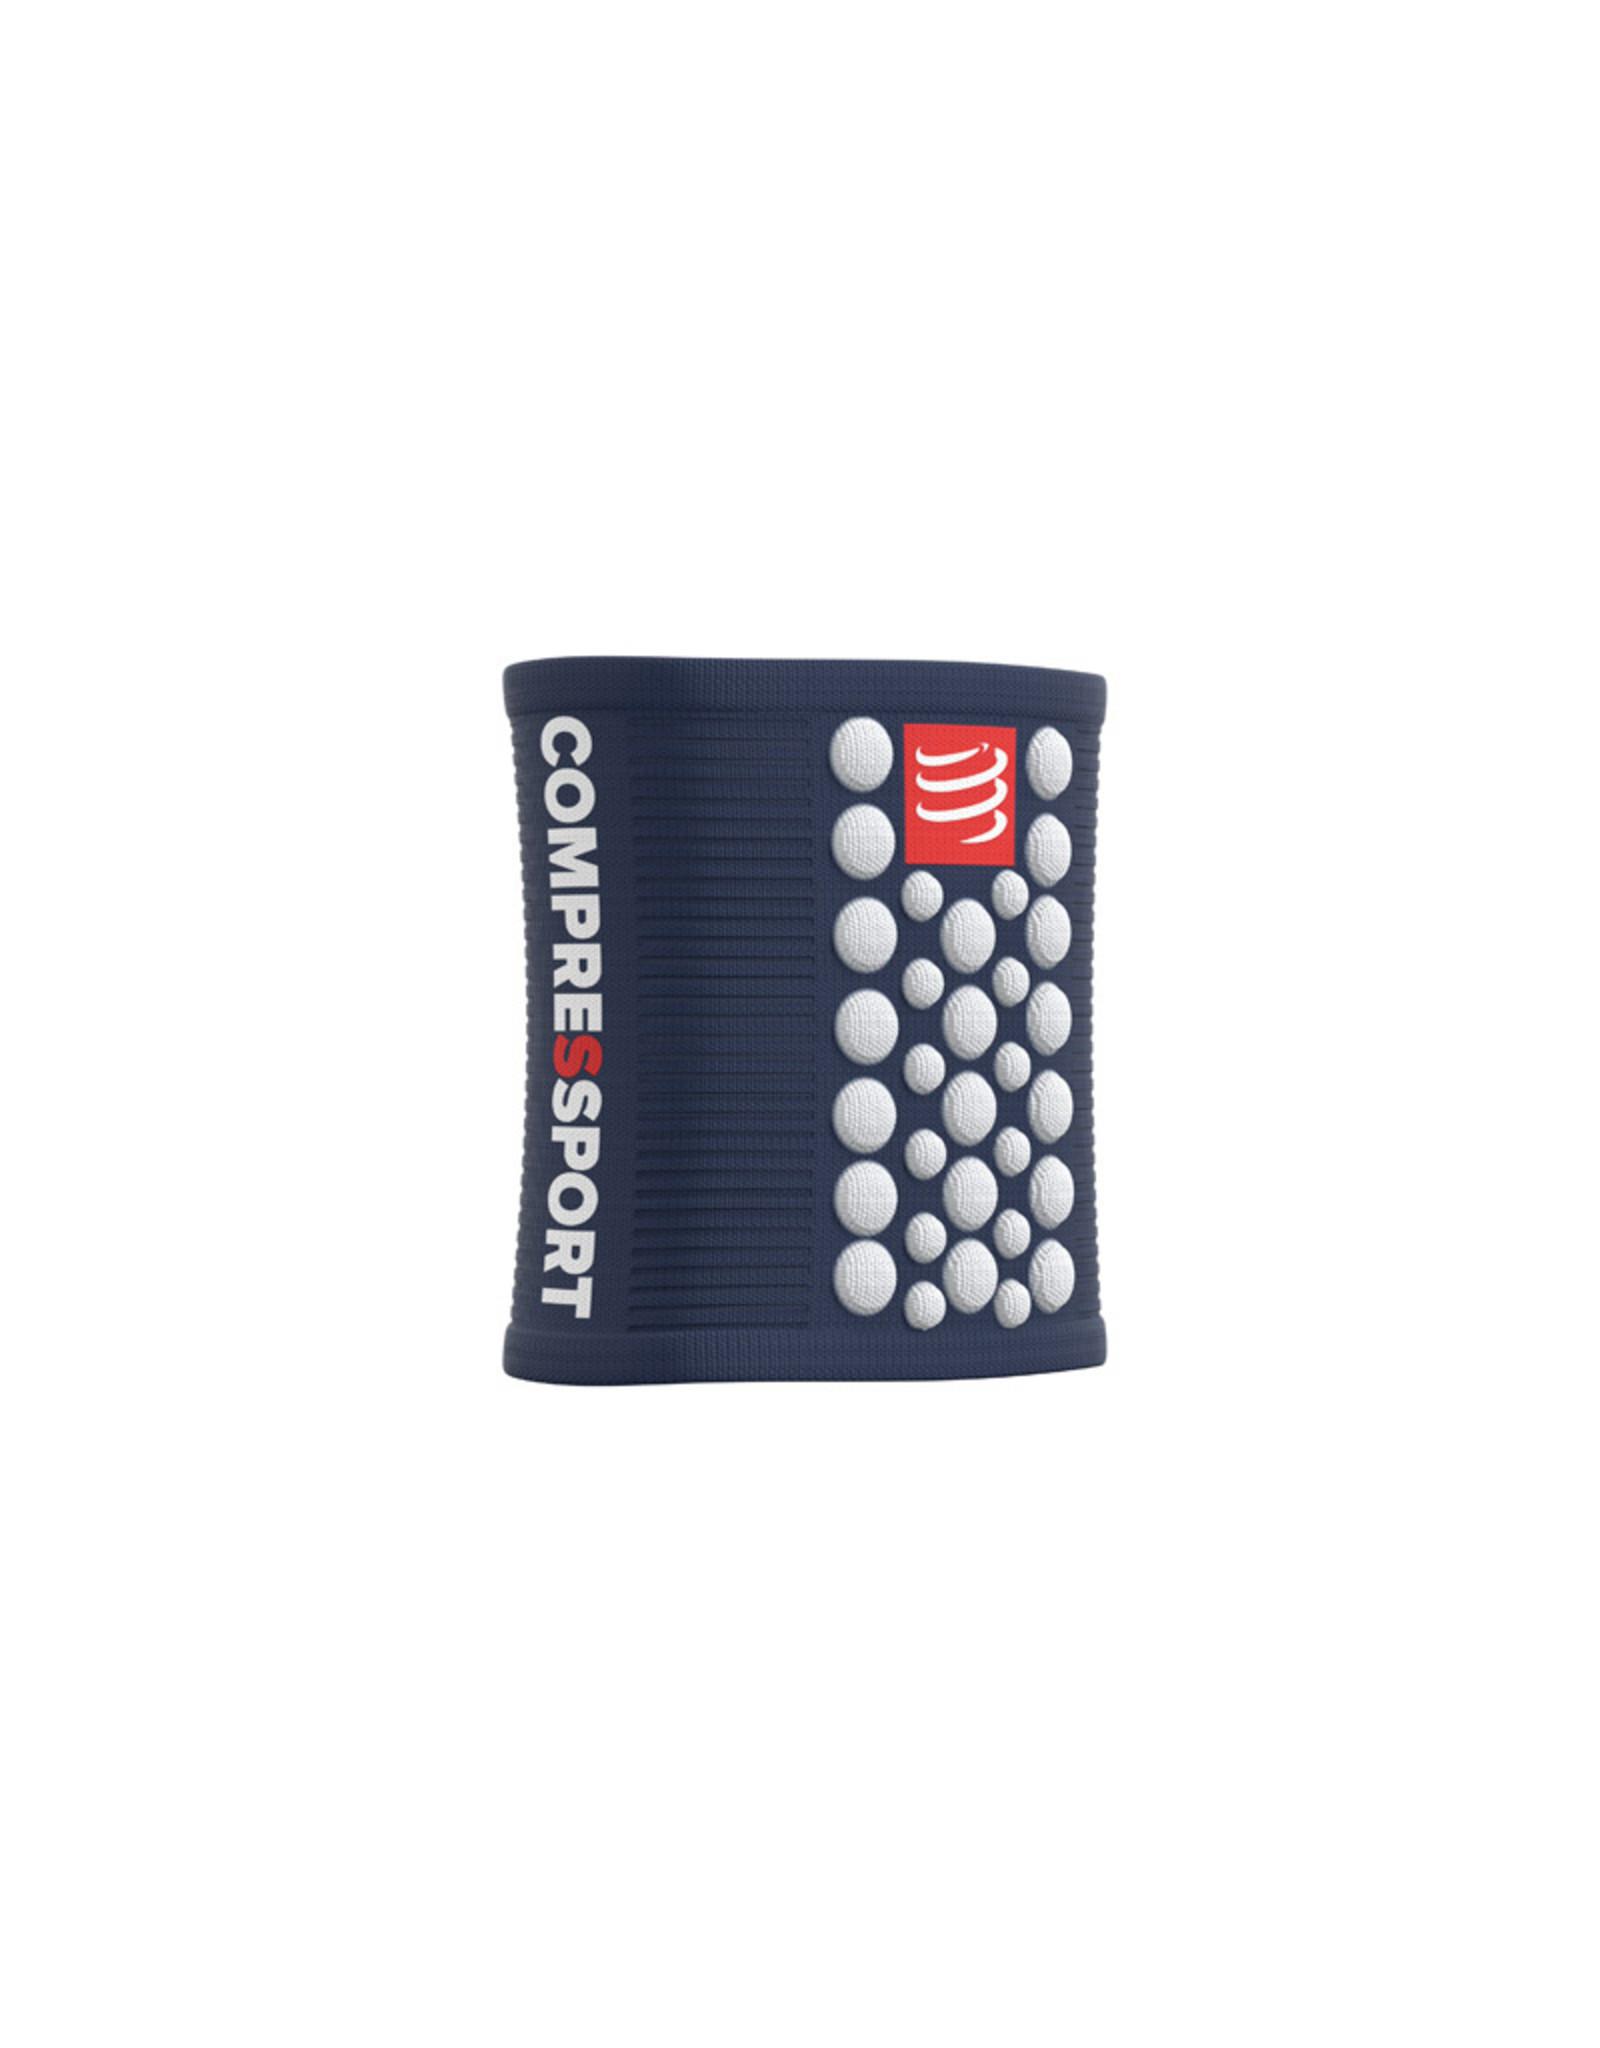 Compressport Zweetbandjes 3D Dots - Blauw/Wit